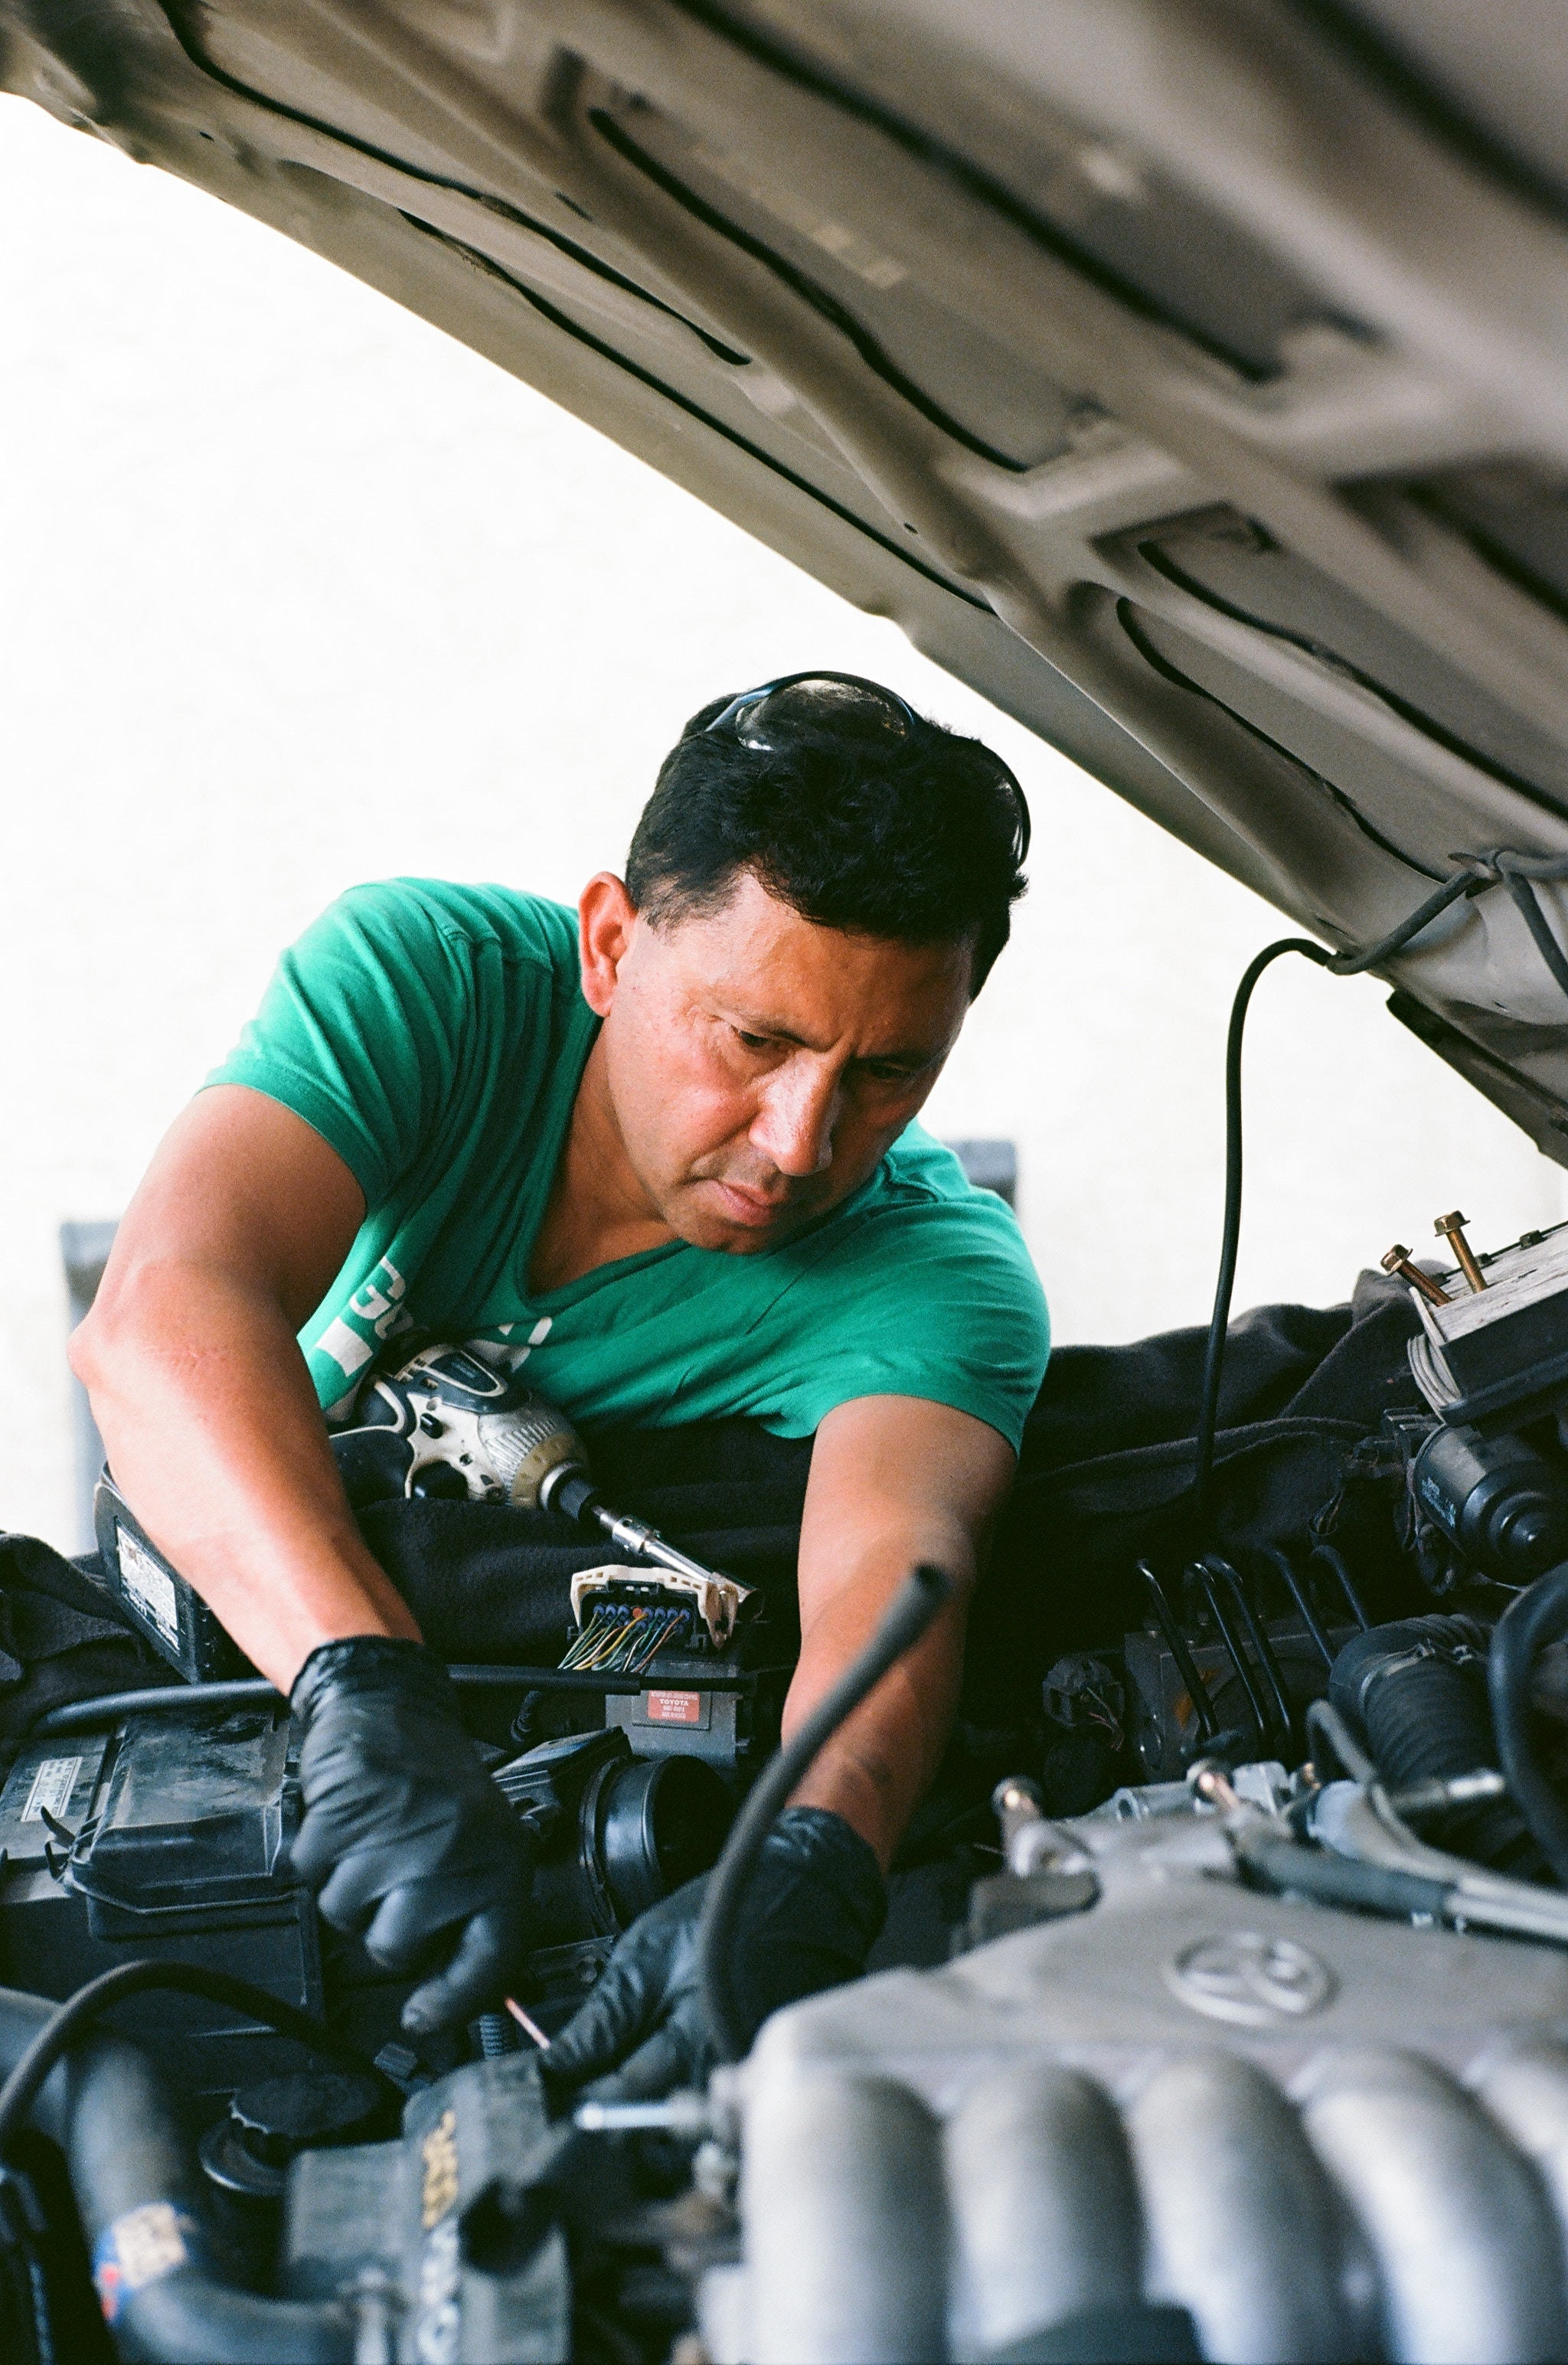 Automotive Service Tech